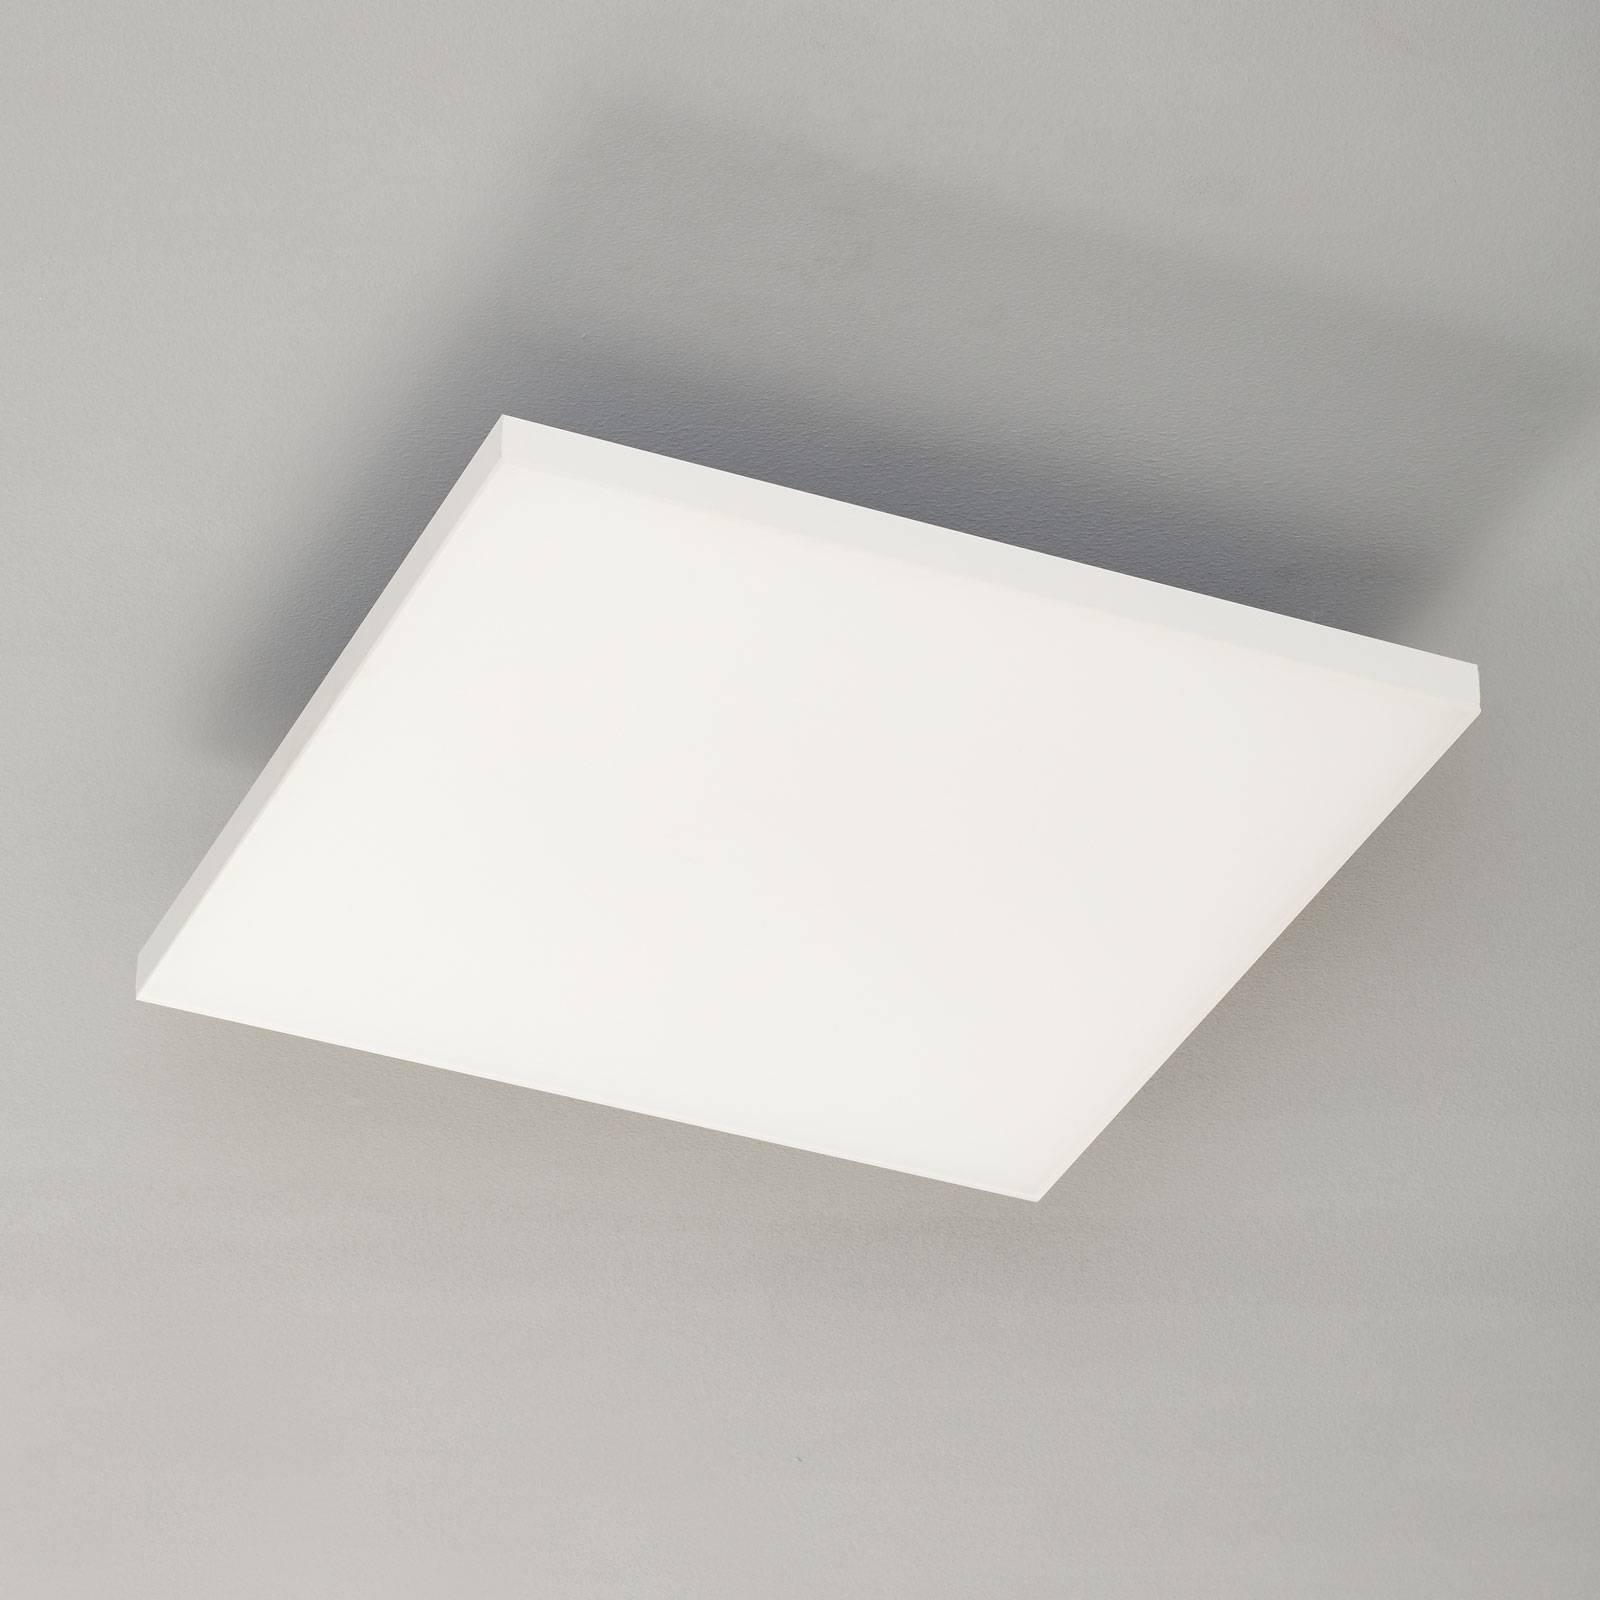 Paul Neuhaus Frameless kattovalaisin CCT 45x45 cm